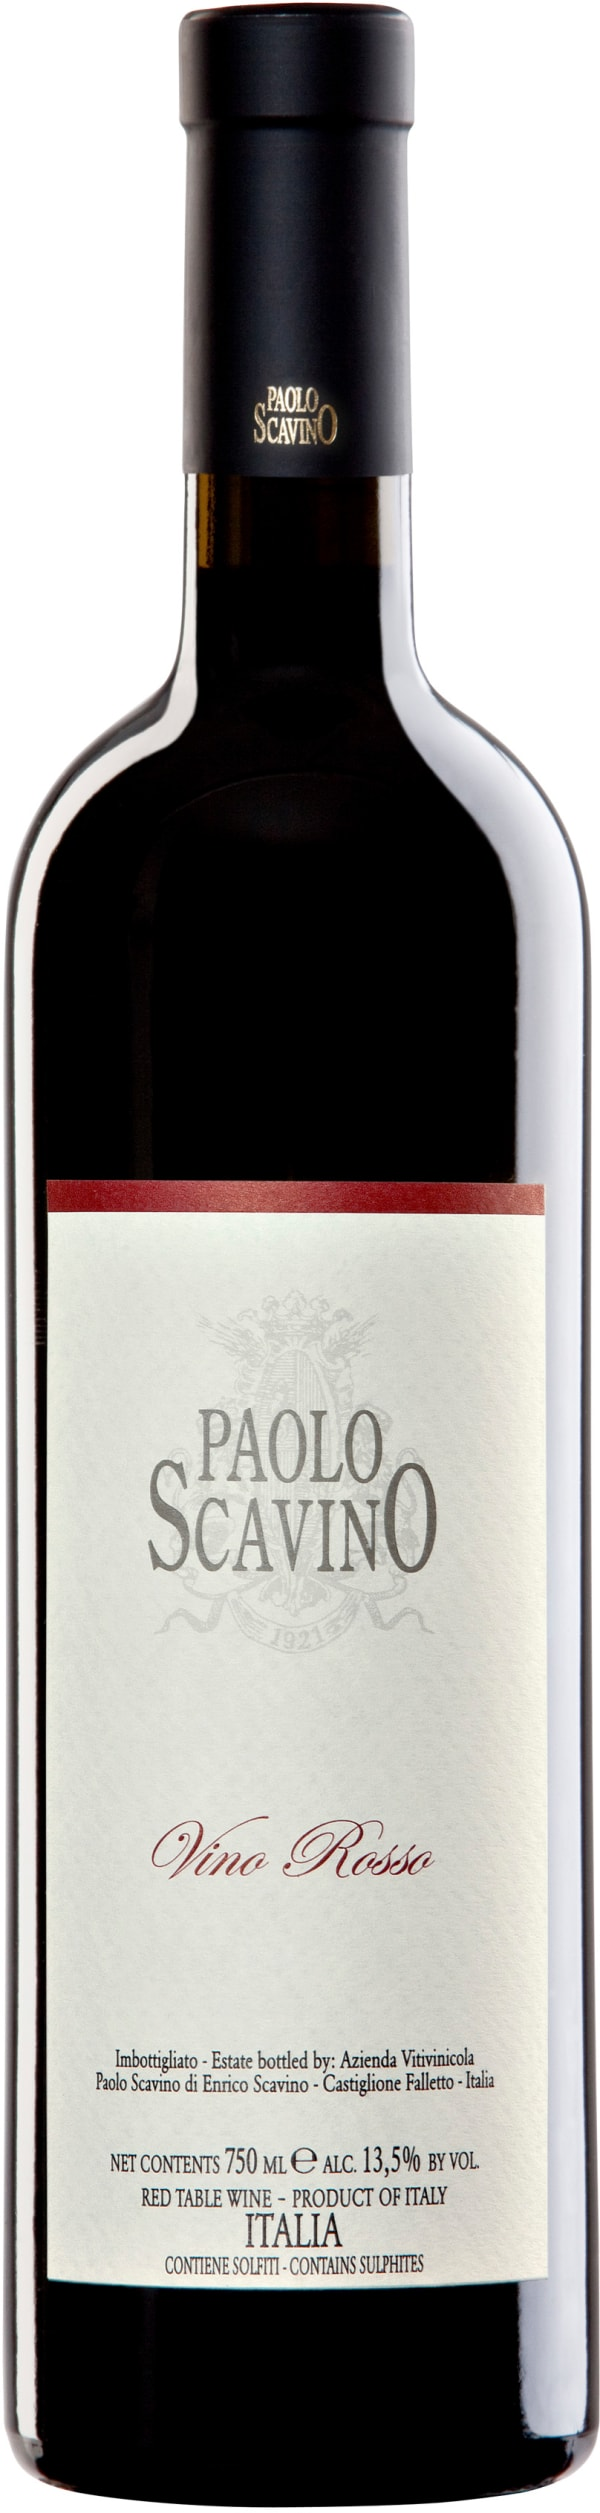 Paolo Scavino Vino Rosso 2019